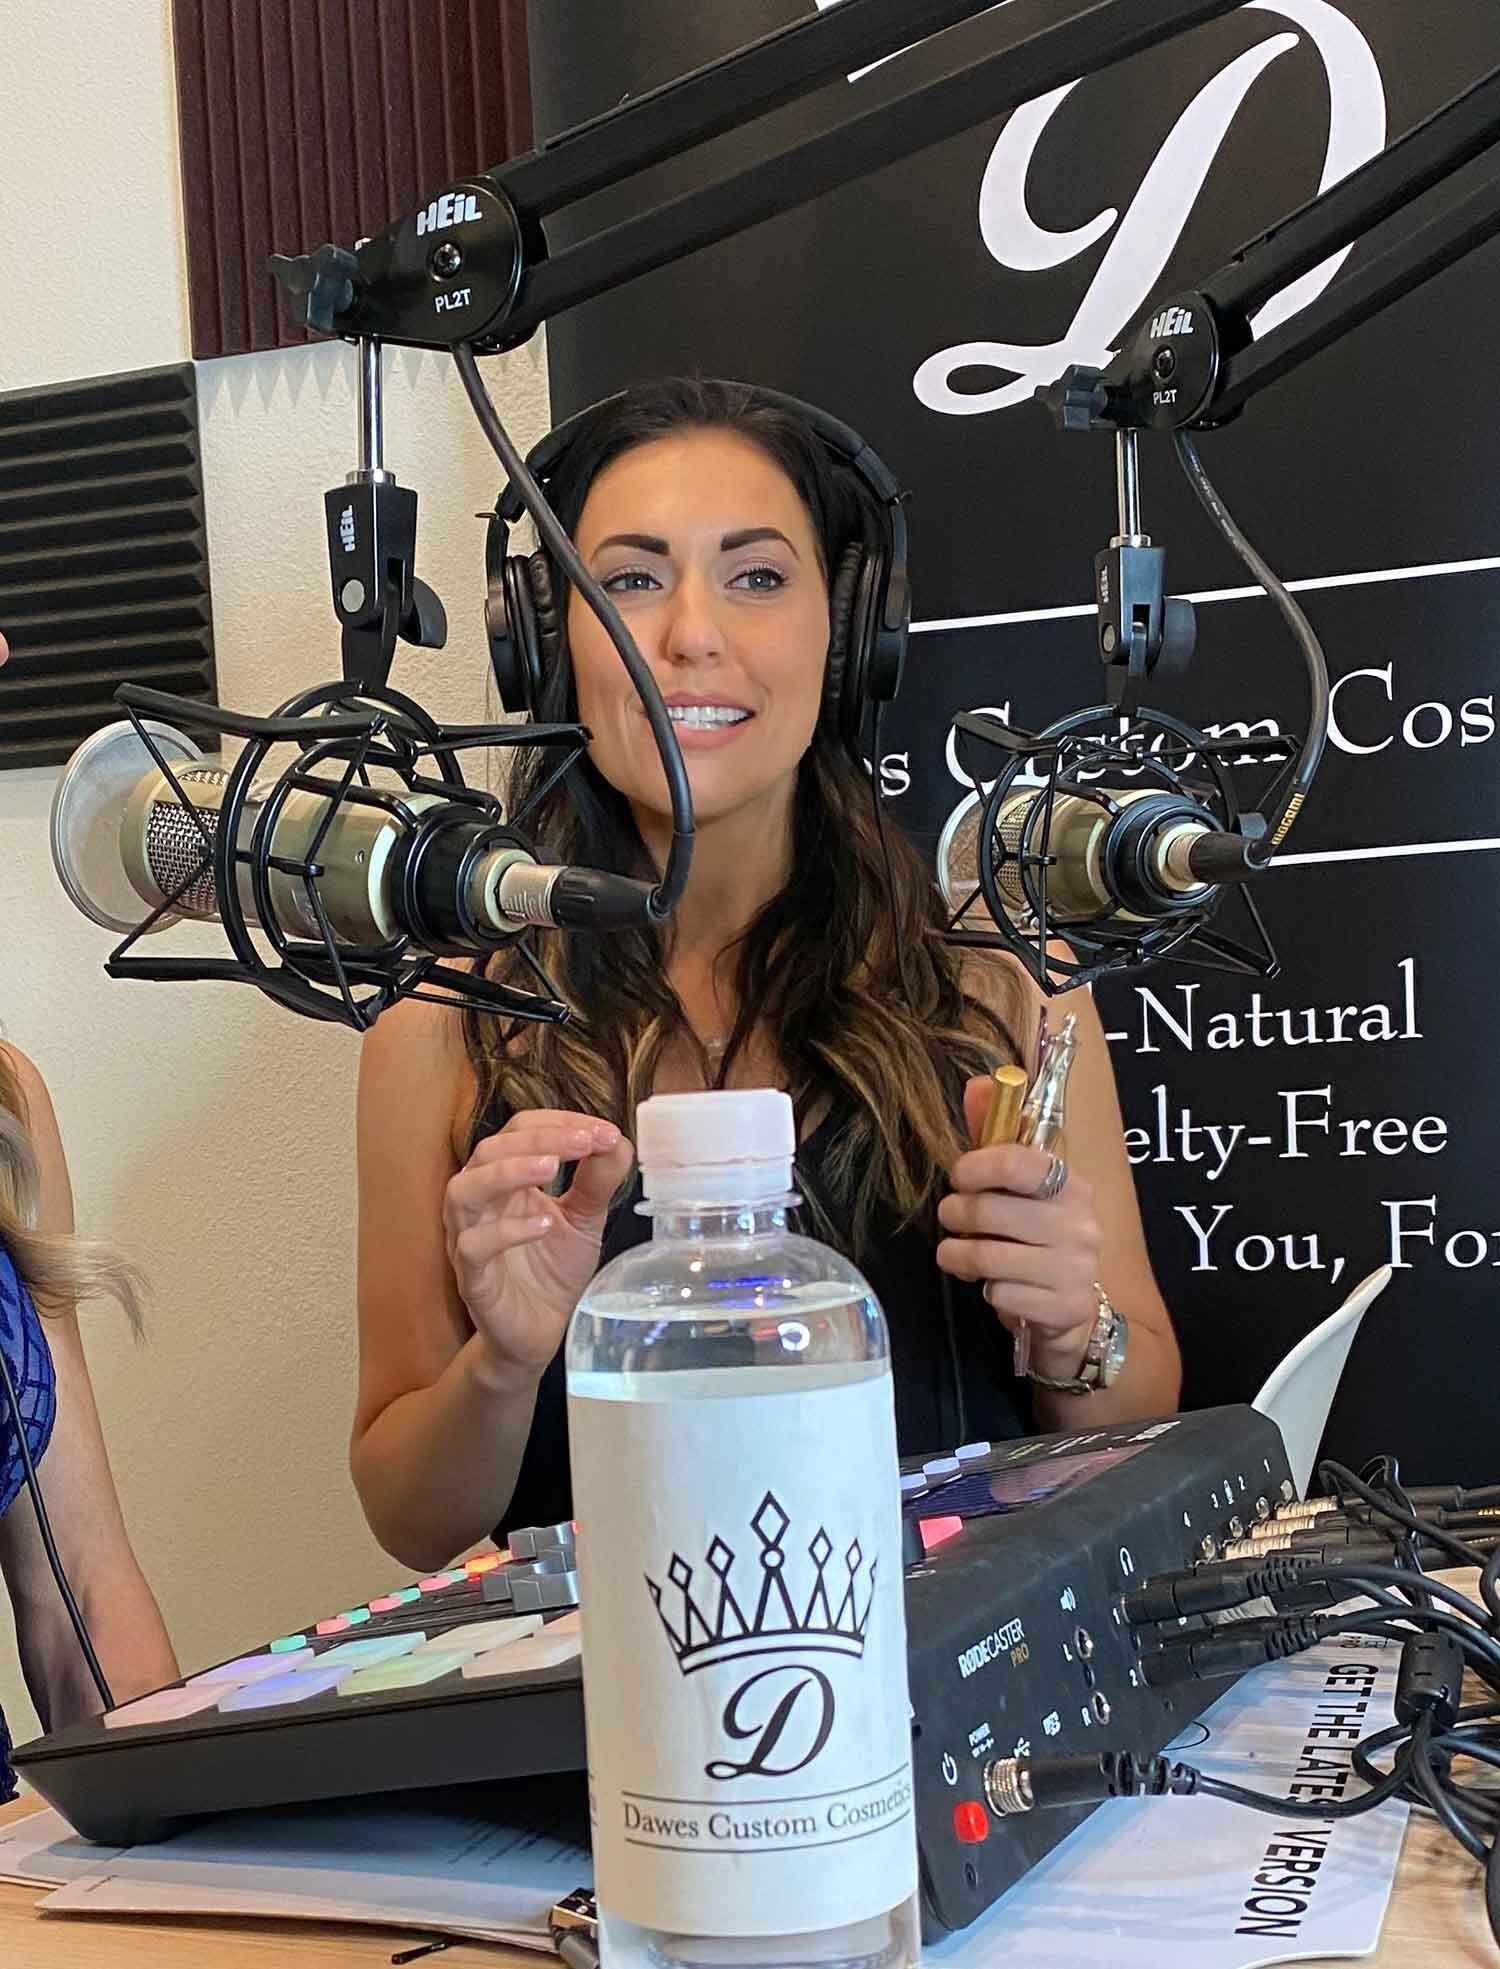 Beauty tips Amanda May Glamour Gains podcast studio